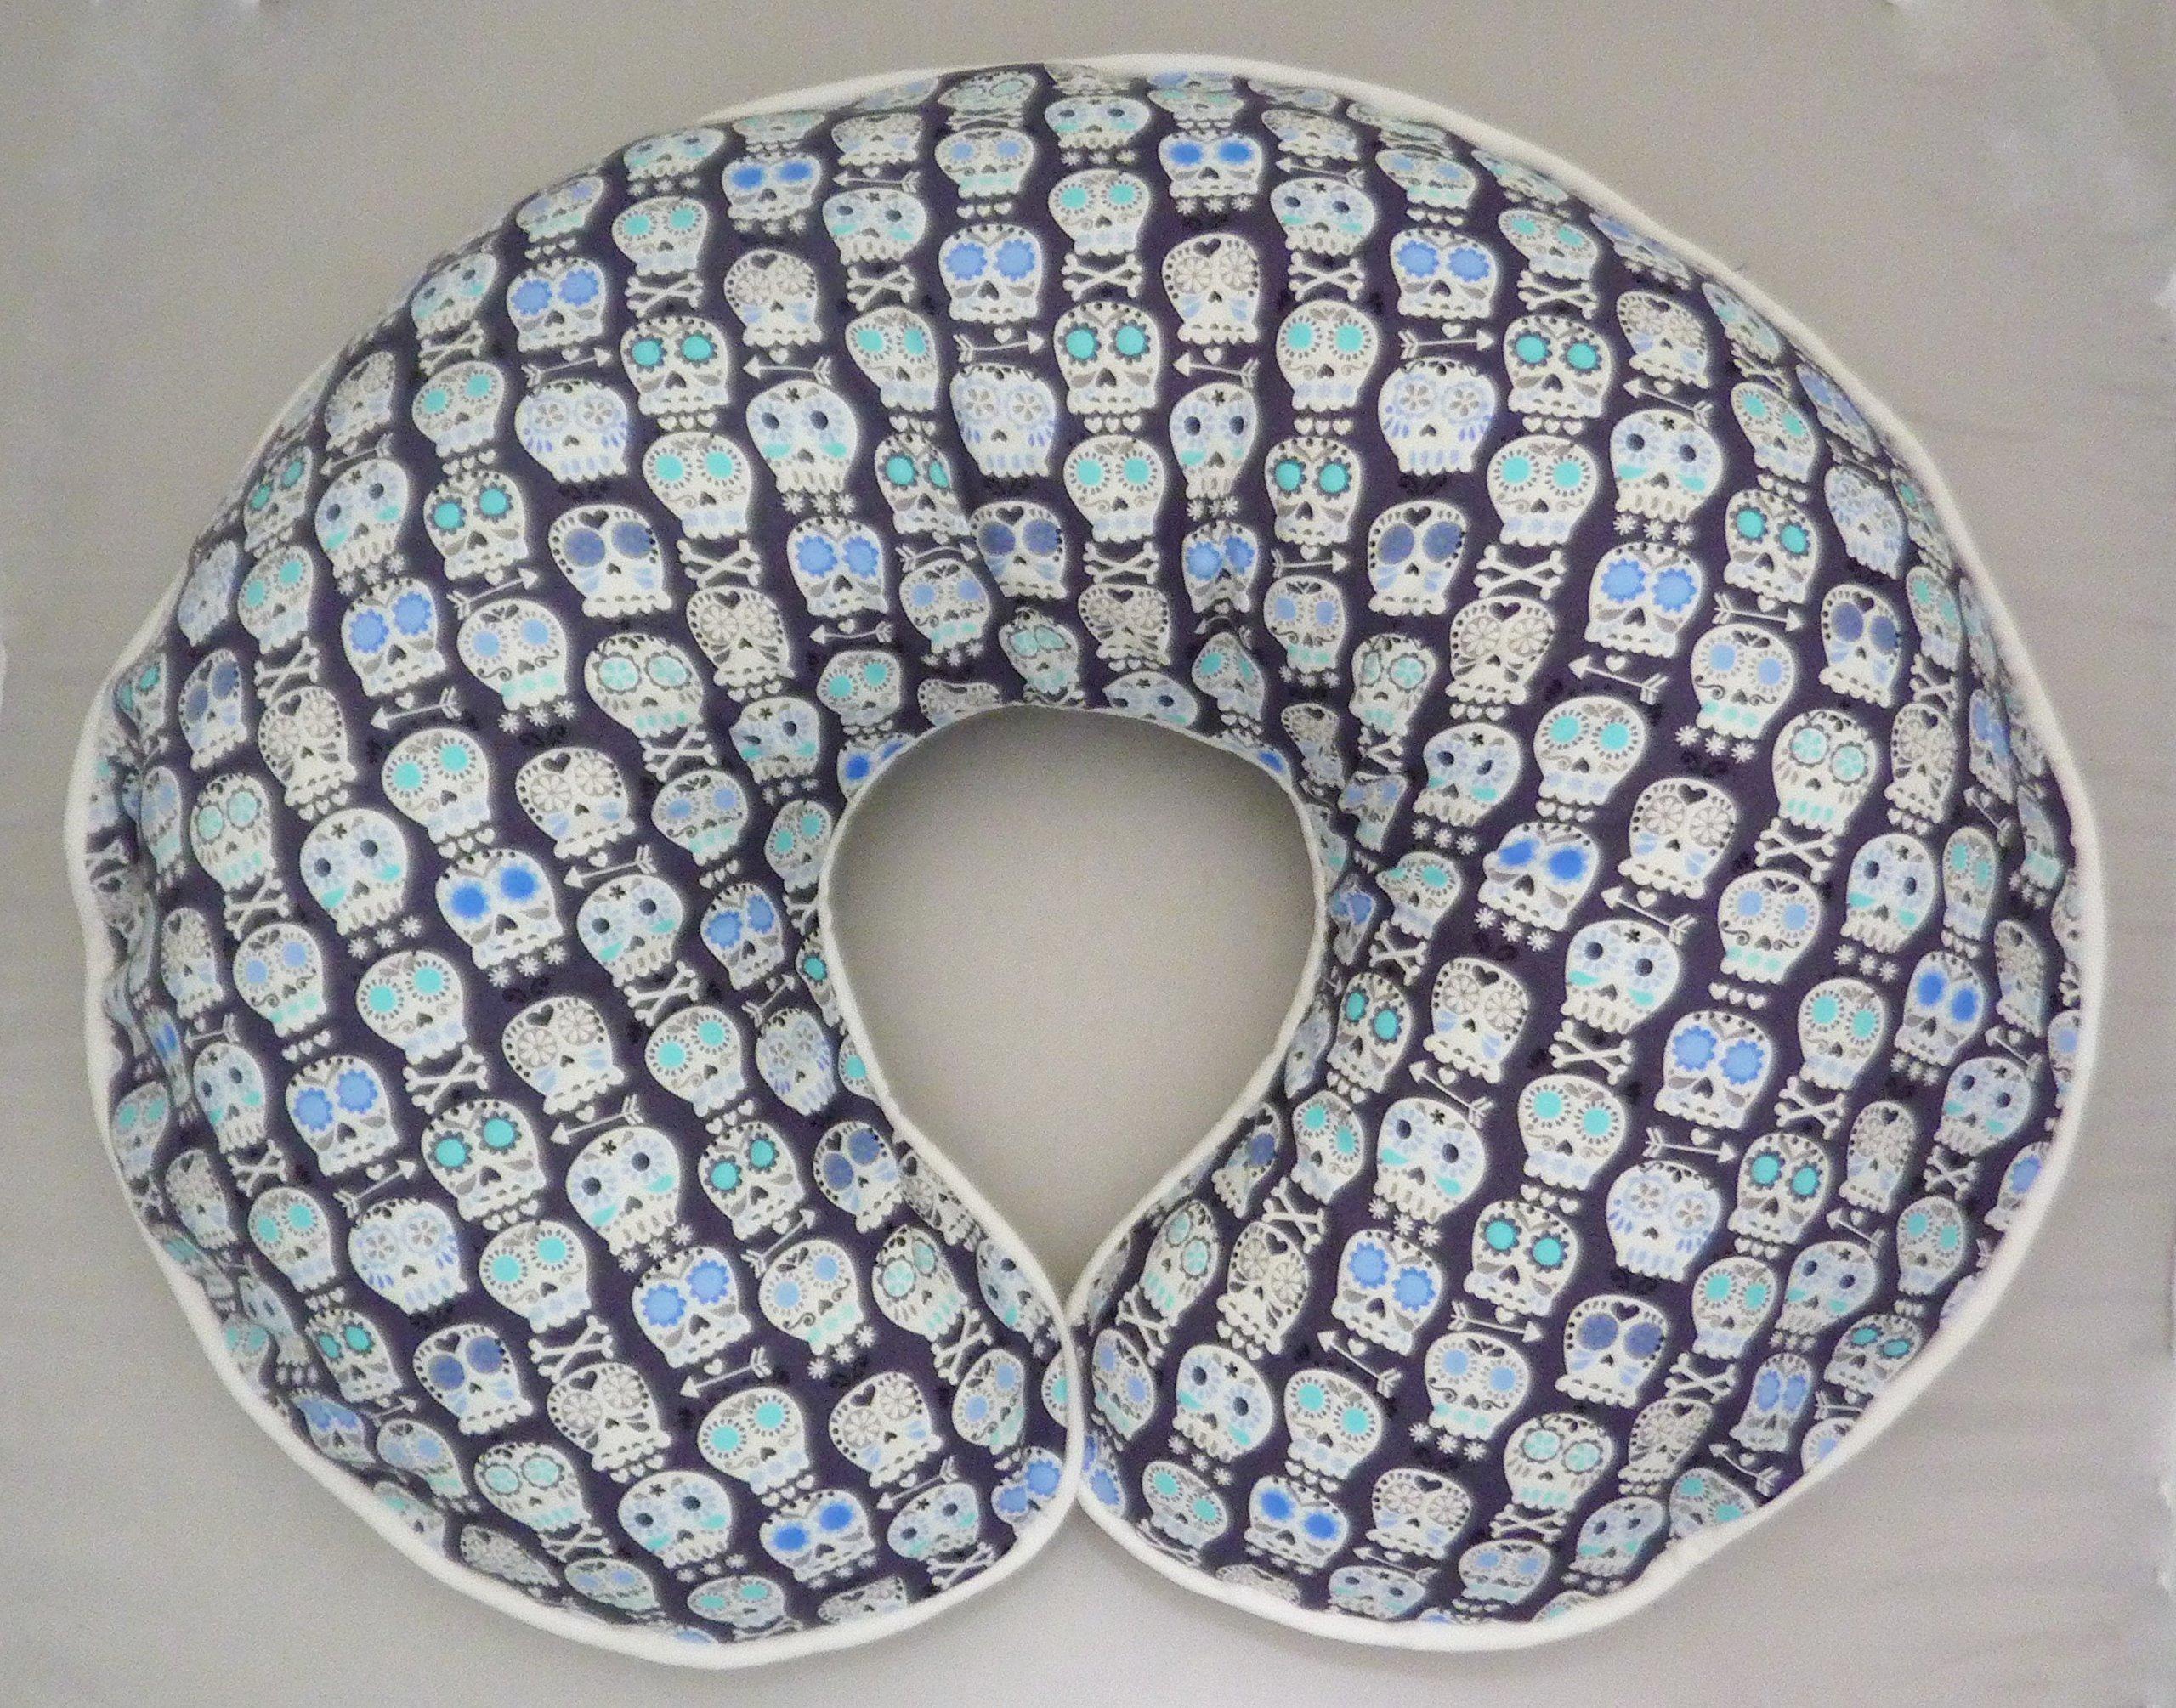 Nursing Pillow Slipcover Bonehead Skulls by Michael Miller in Charcoal